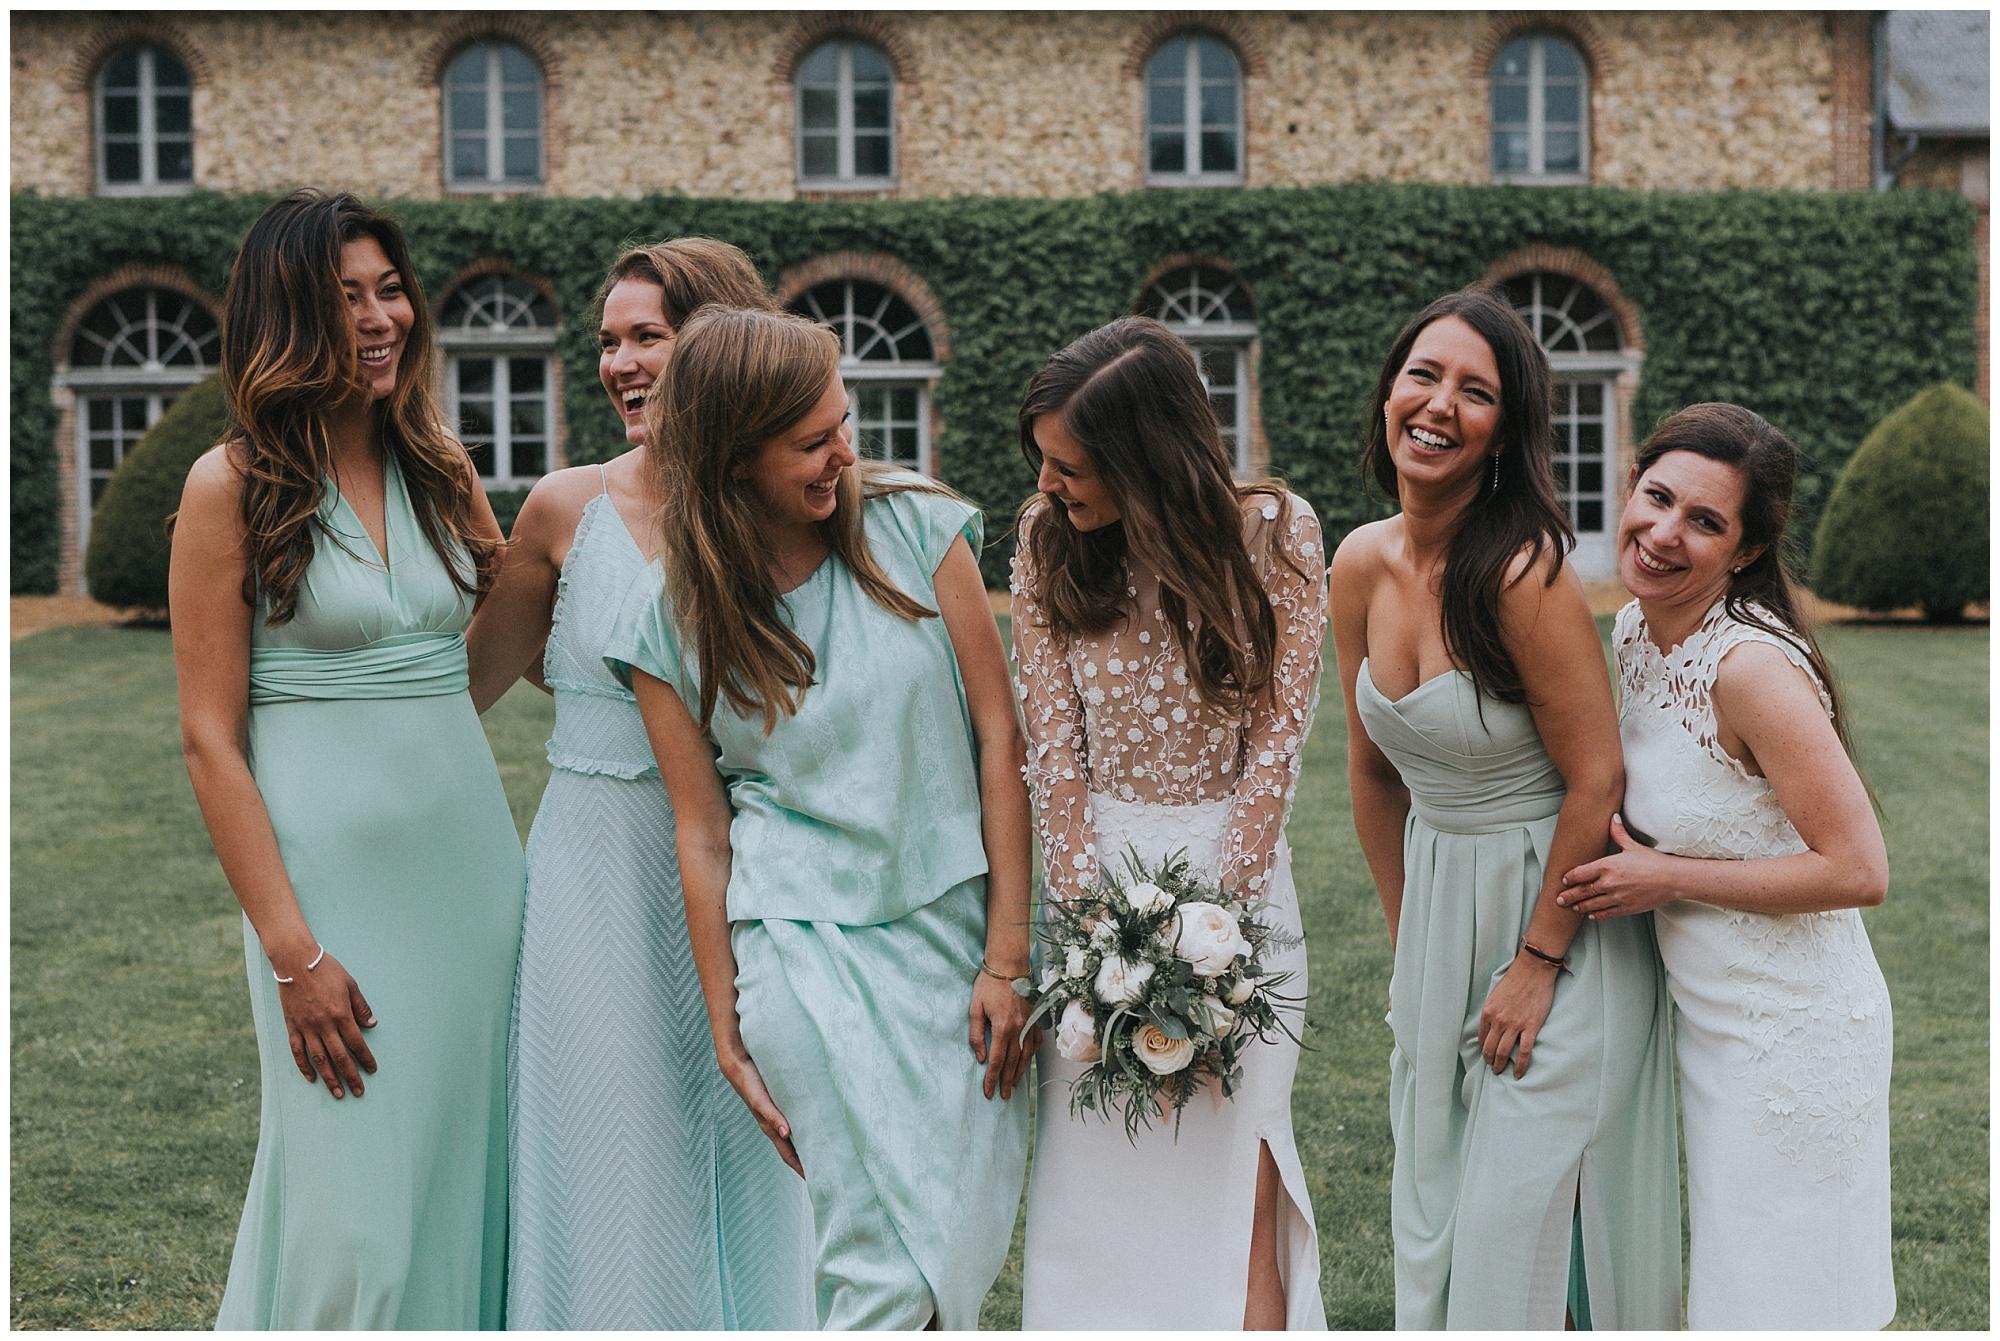 Kateryna-photos-photographer-reims-domaine-des-evis-mariage-normandie-rime-arodaky-photos-de-groupe